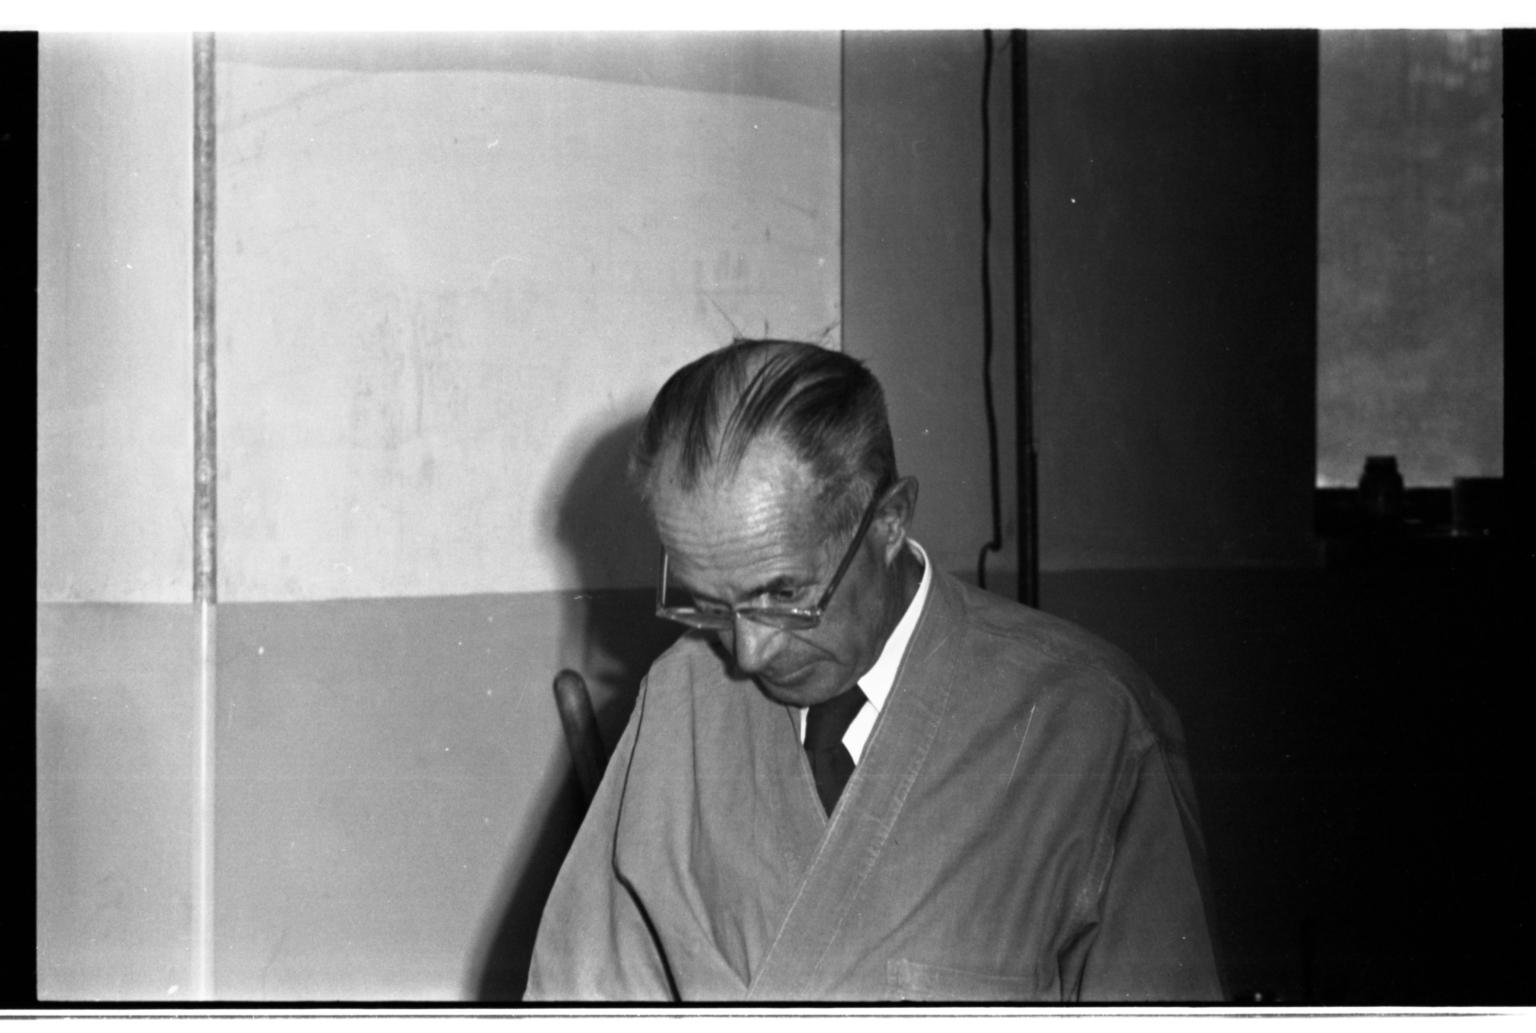 Robert J. Niedrach